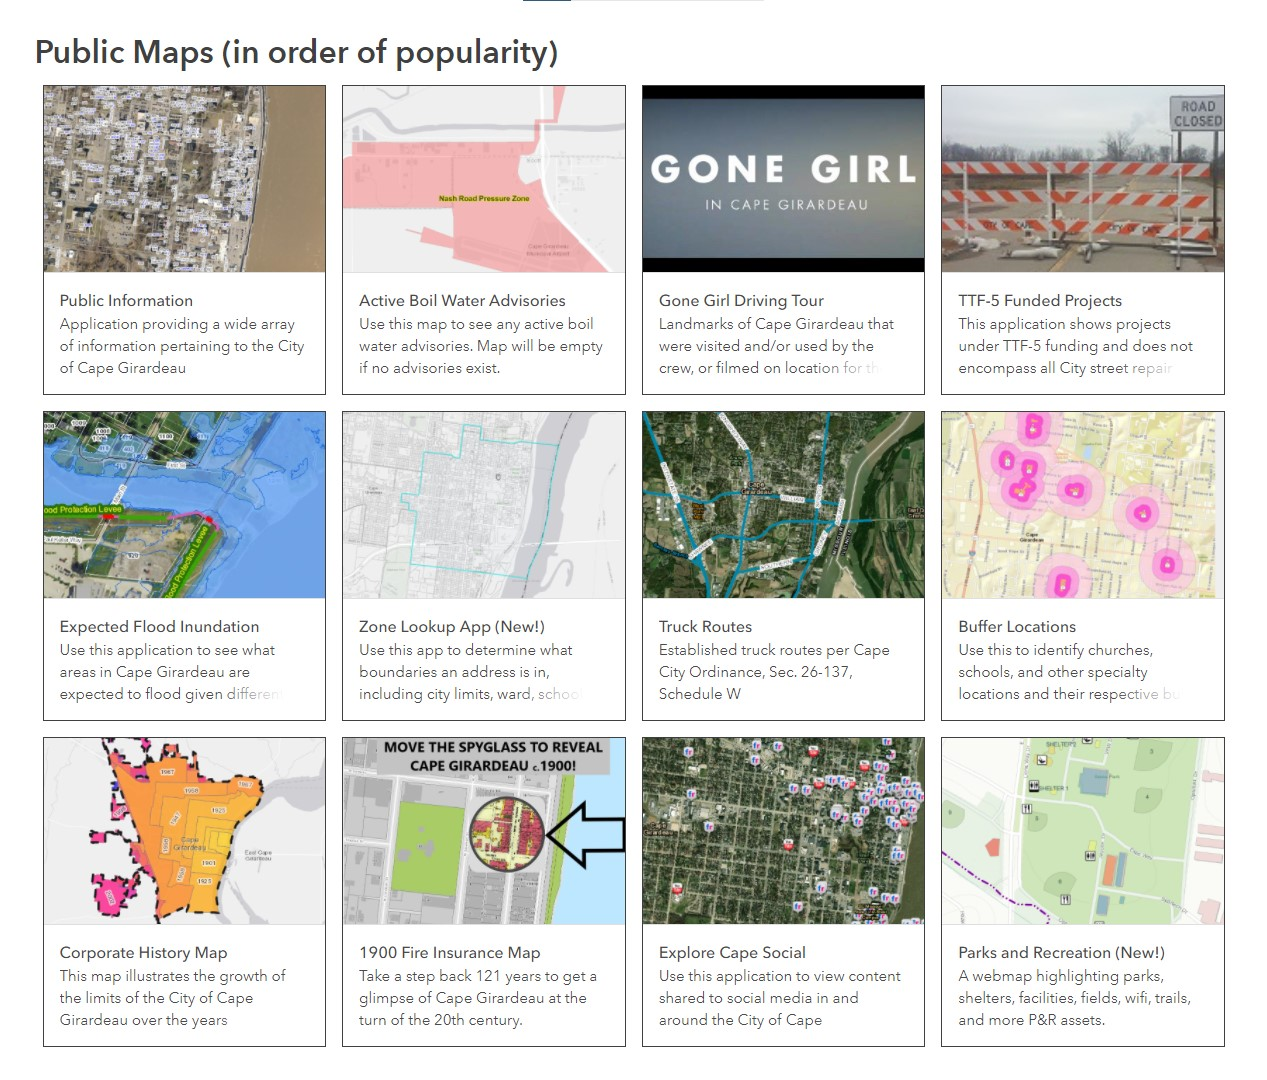 COCG.MAPS SNIP